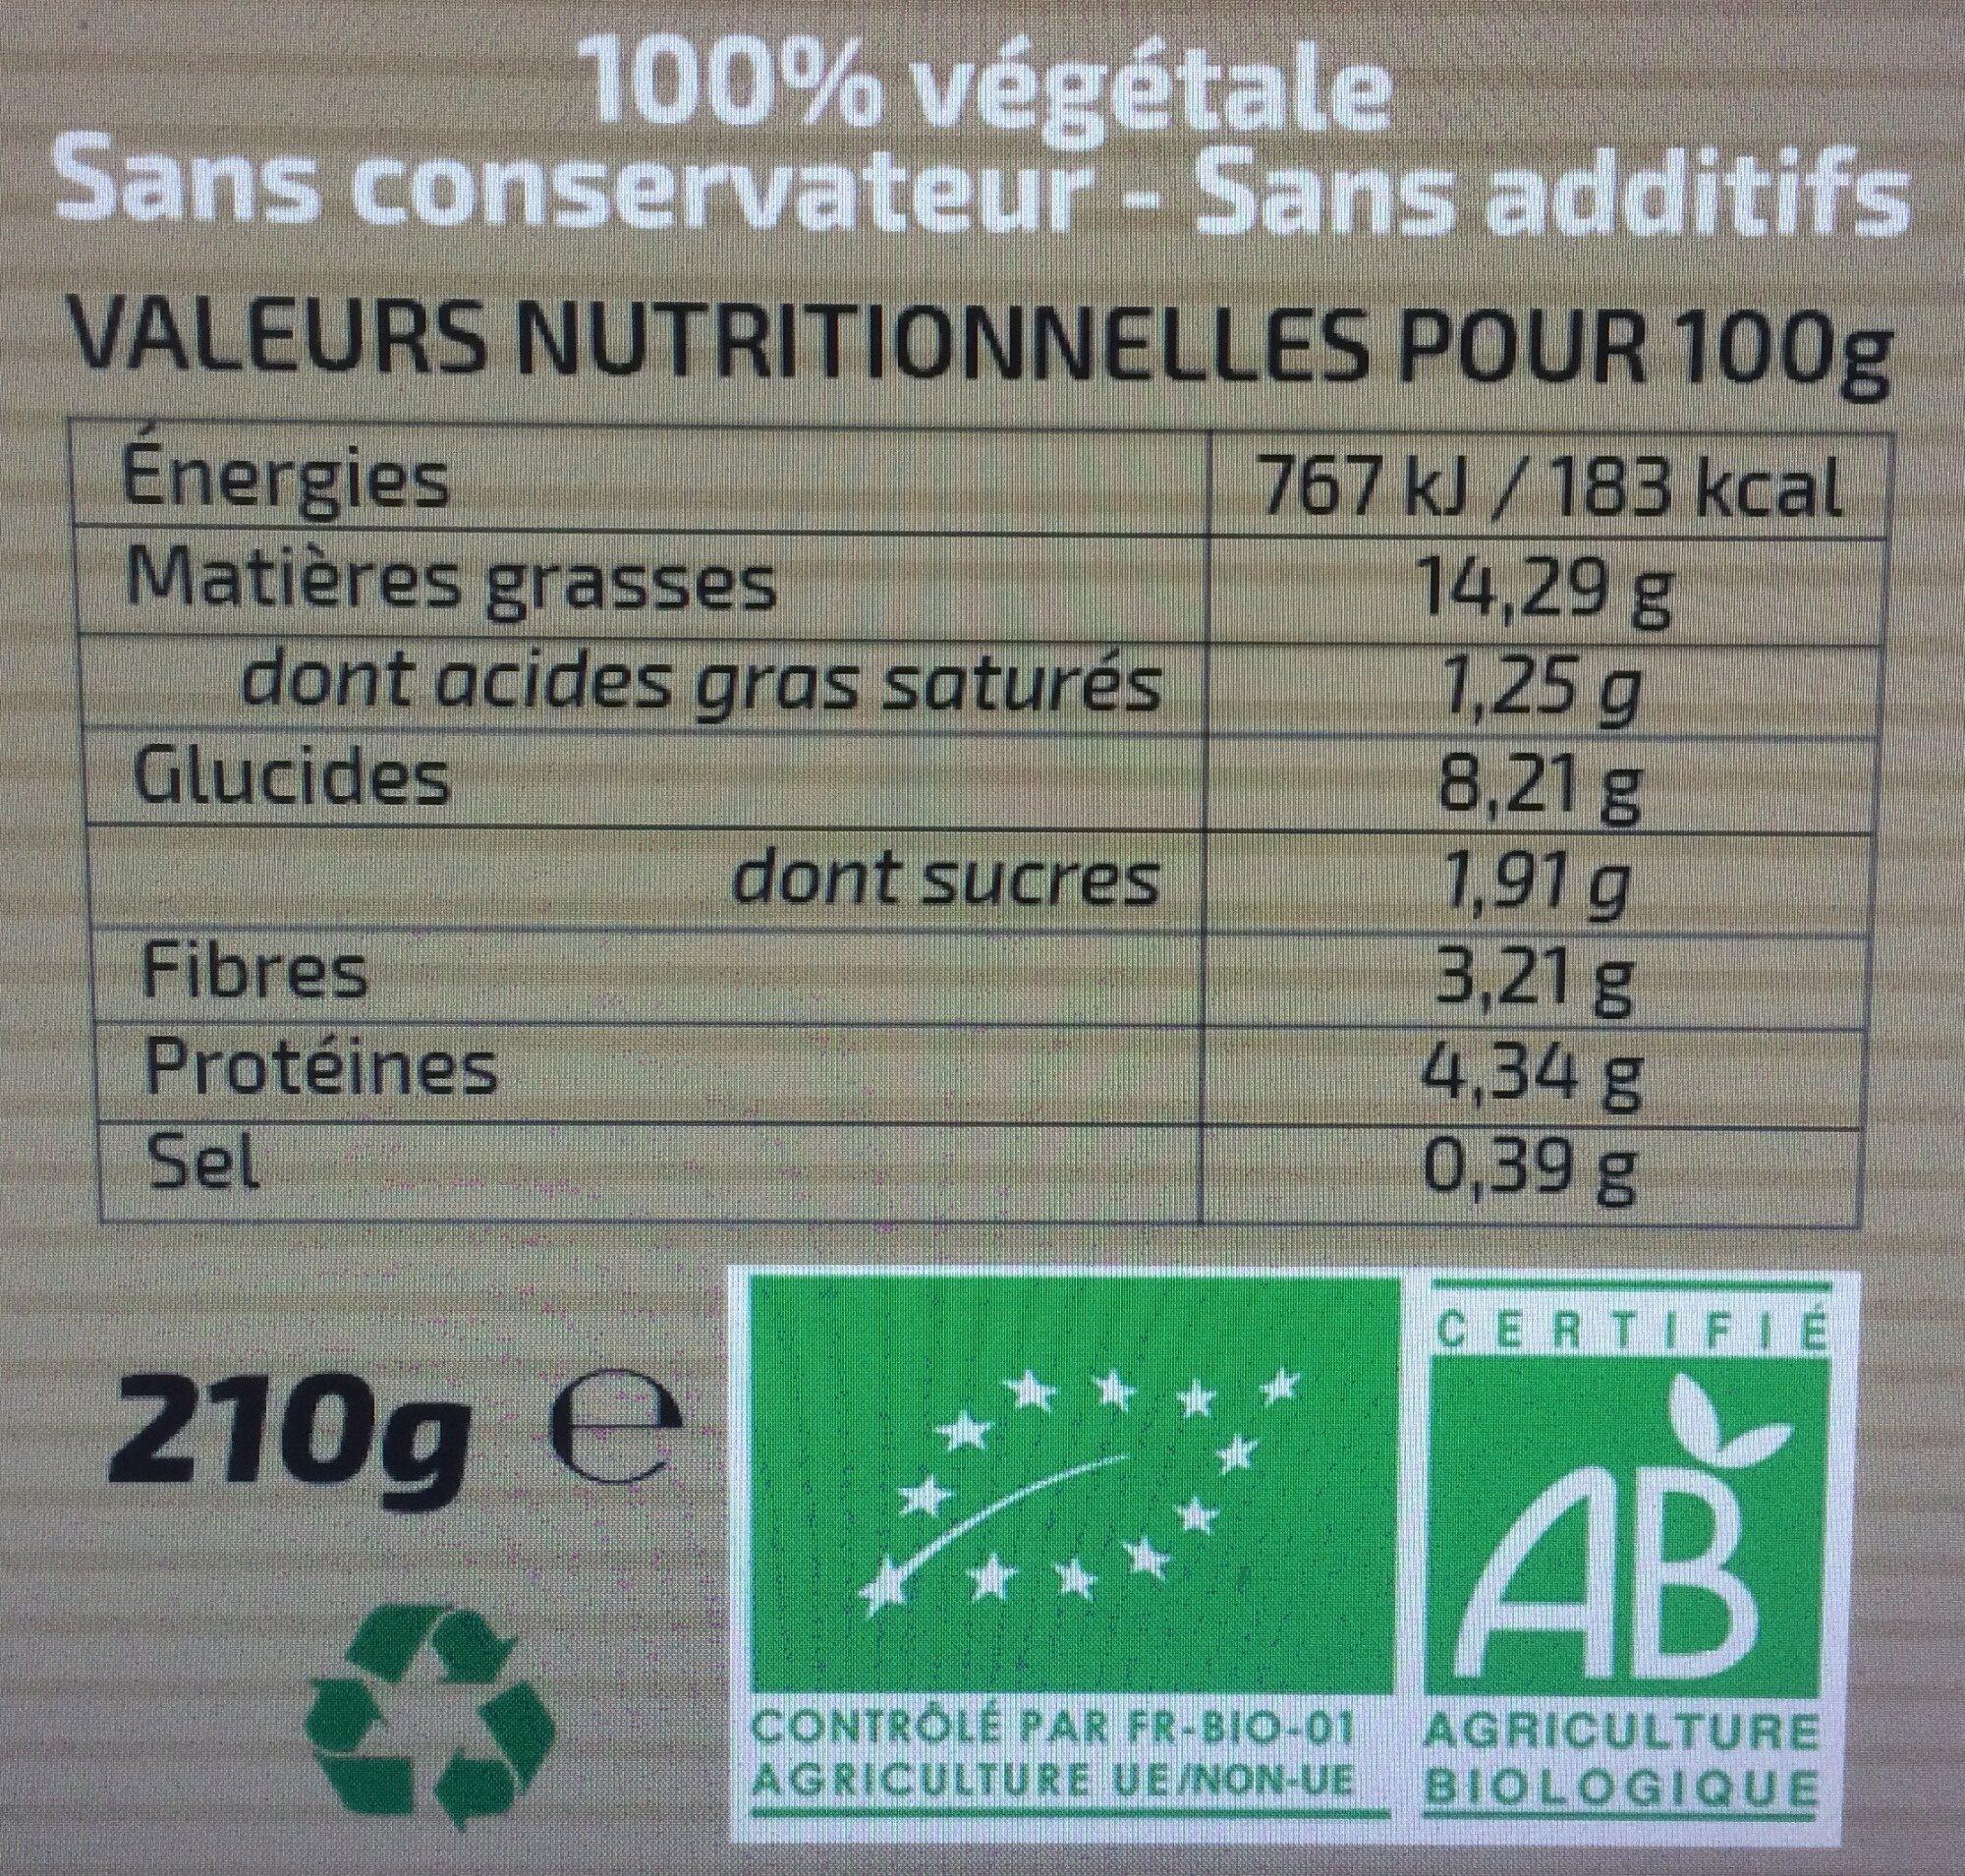 Sauce condimentaire estragon oignon - Voedingswaarden - fr